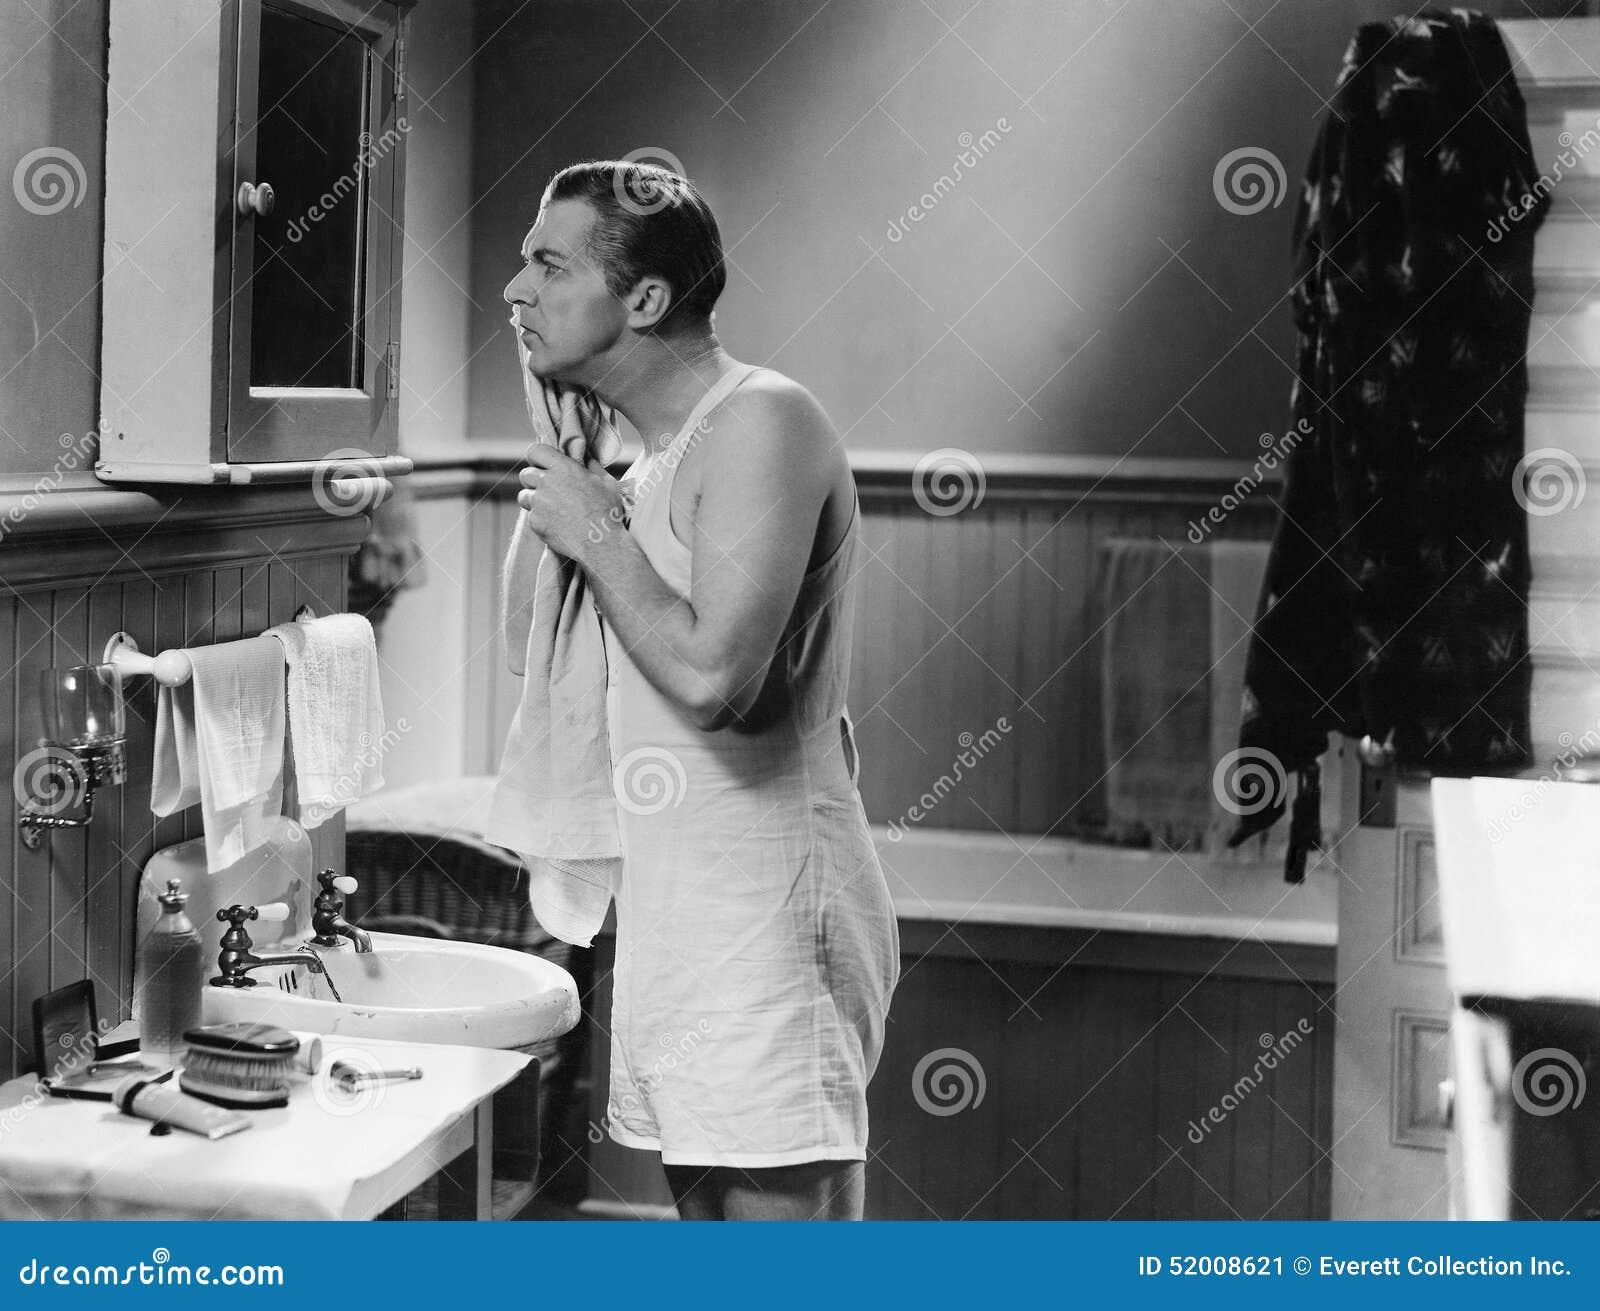 Man at bathroom mirror